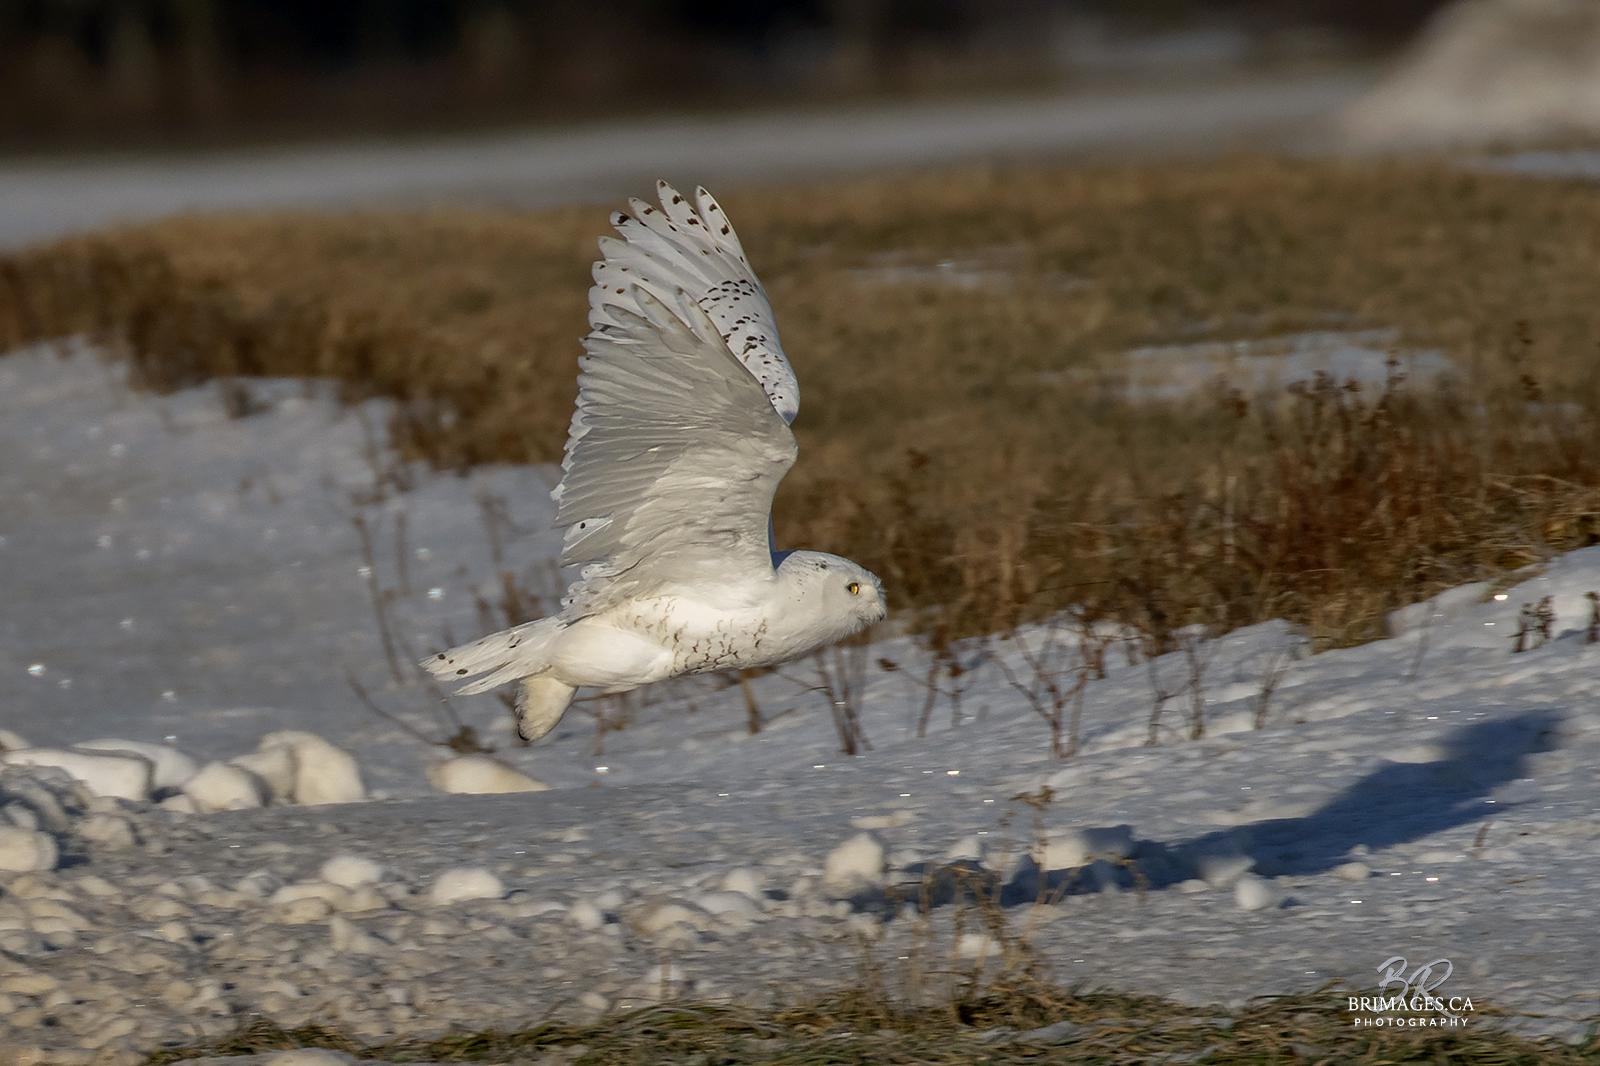 snowy-owl-in-flight-new-brunswick-4-BRimages.ca